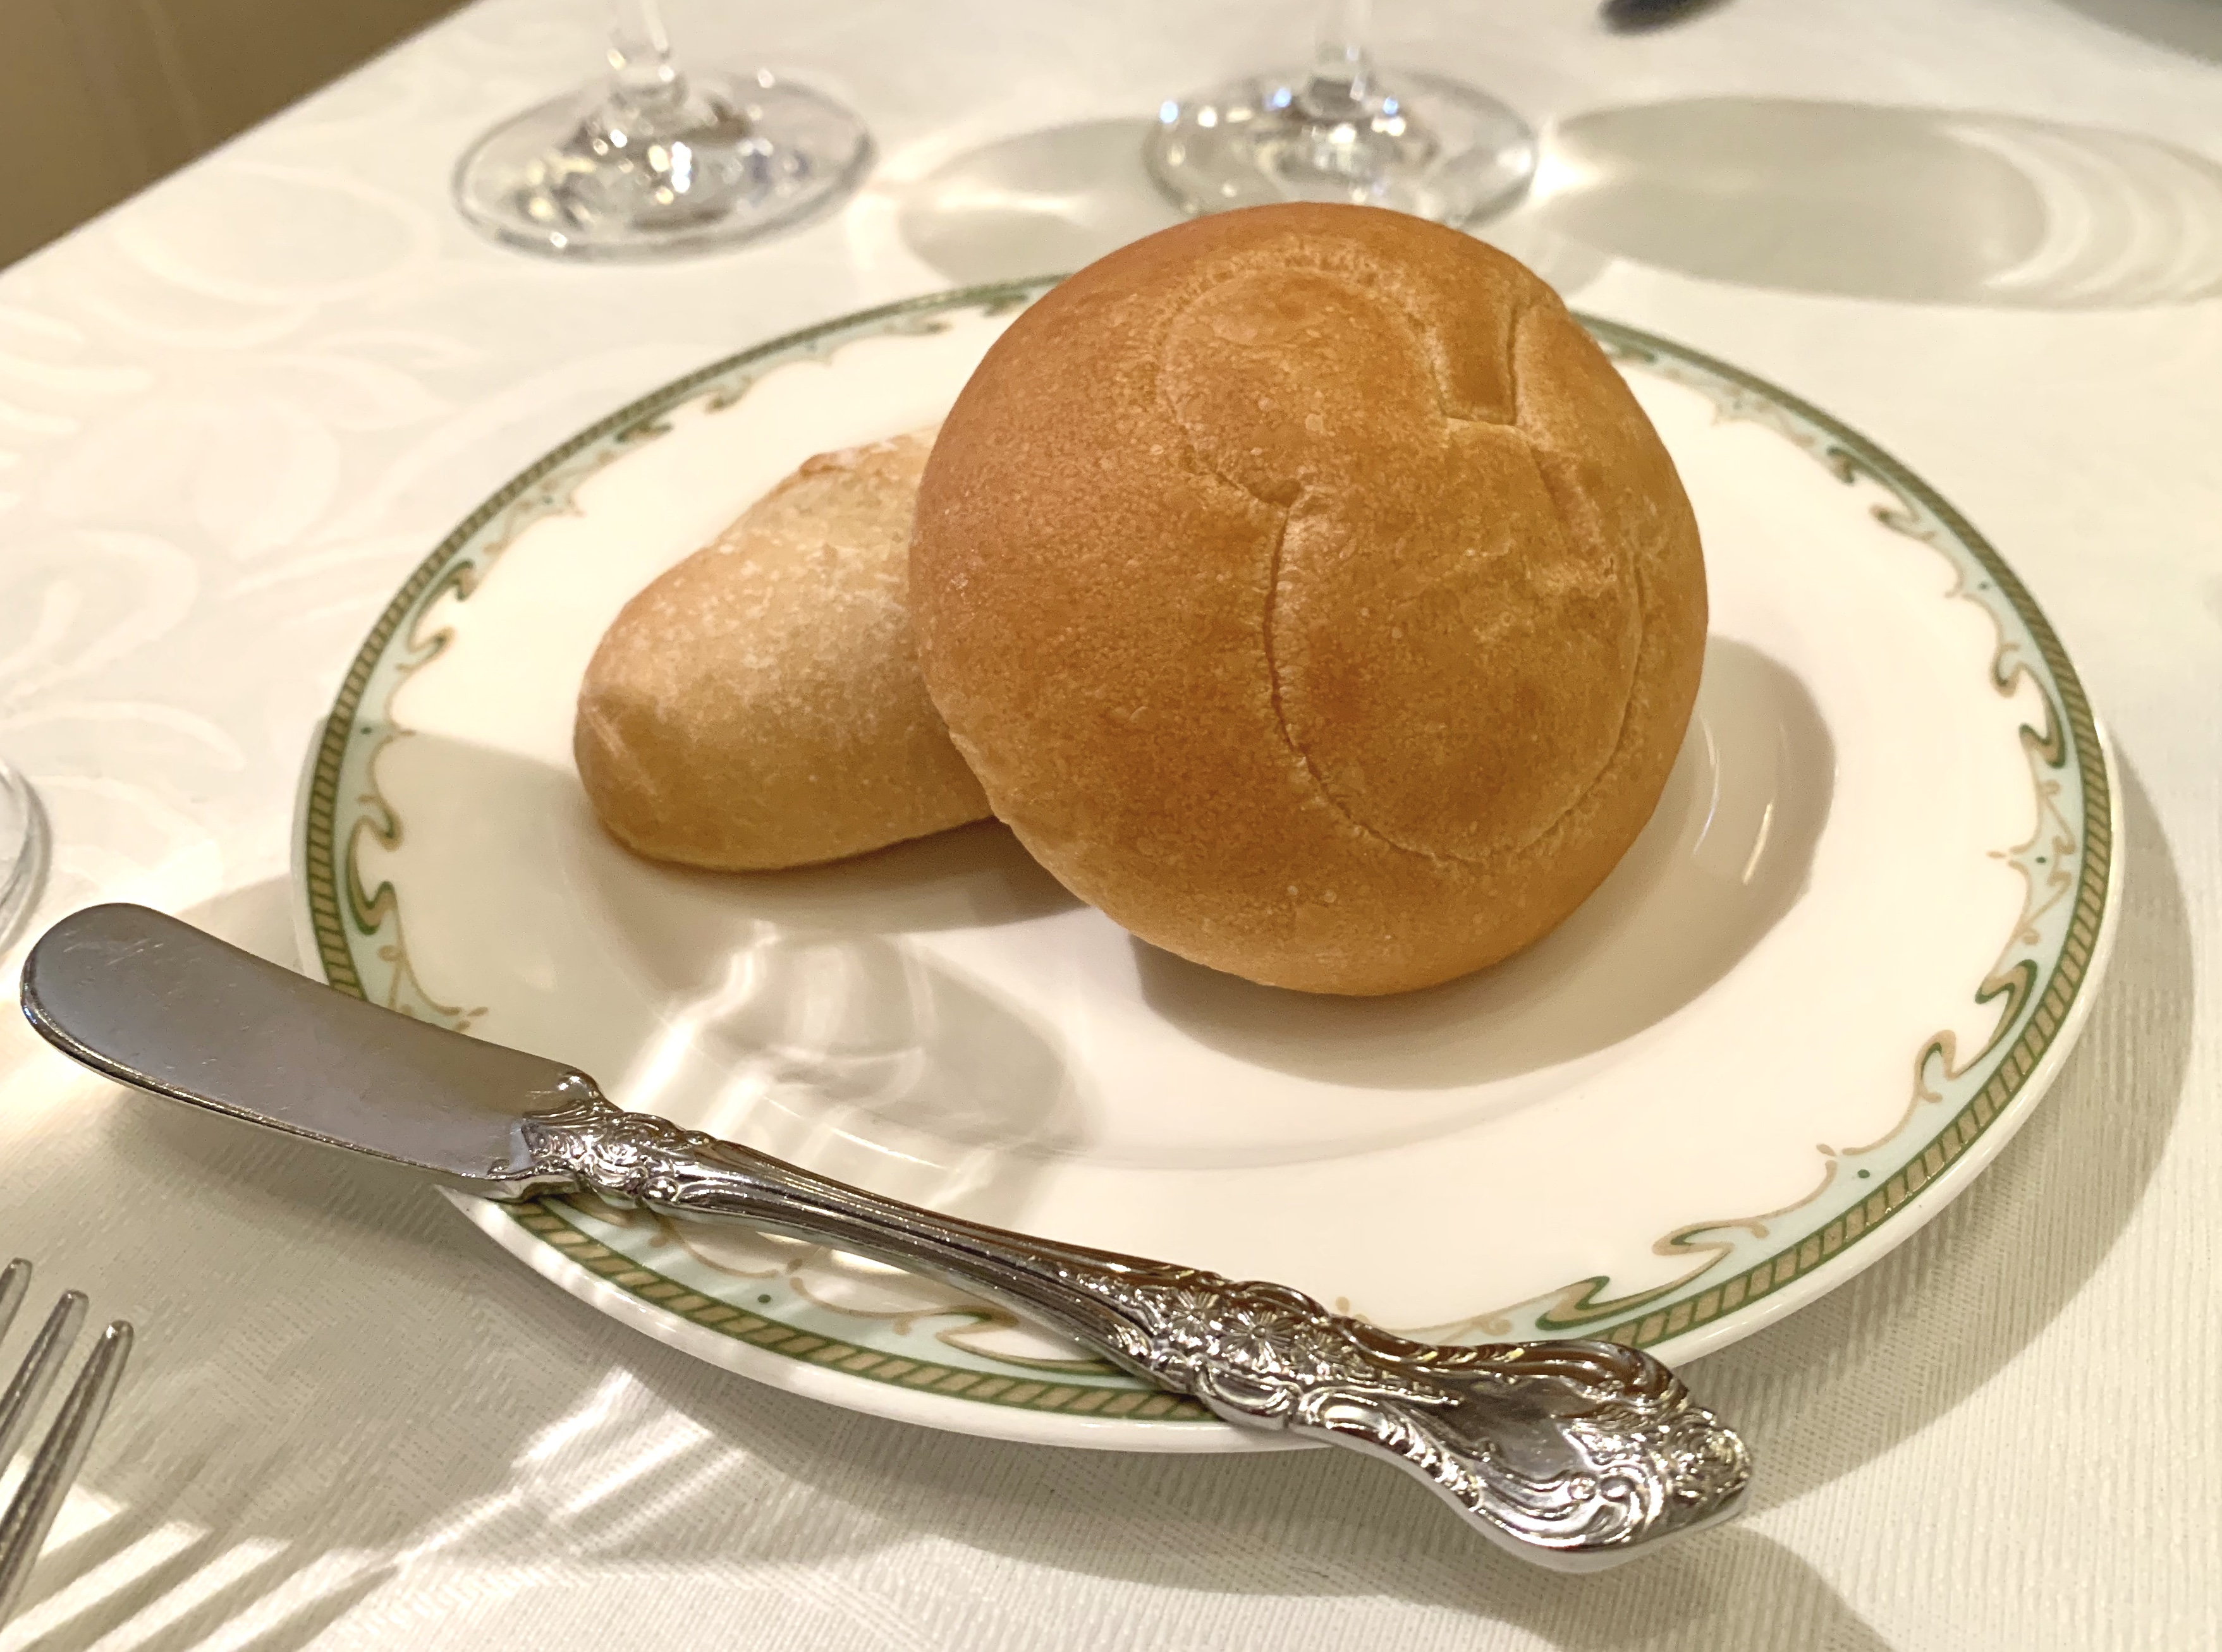 S.S. Columbia Dining Room Tokyo DisneySea Christmas Lunch Mickey Bread